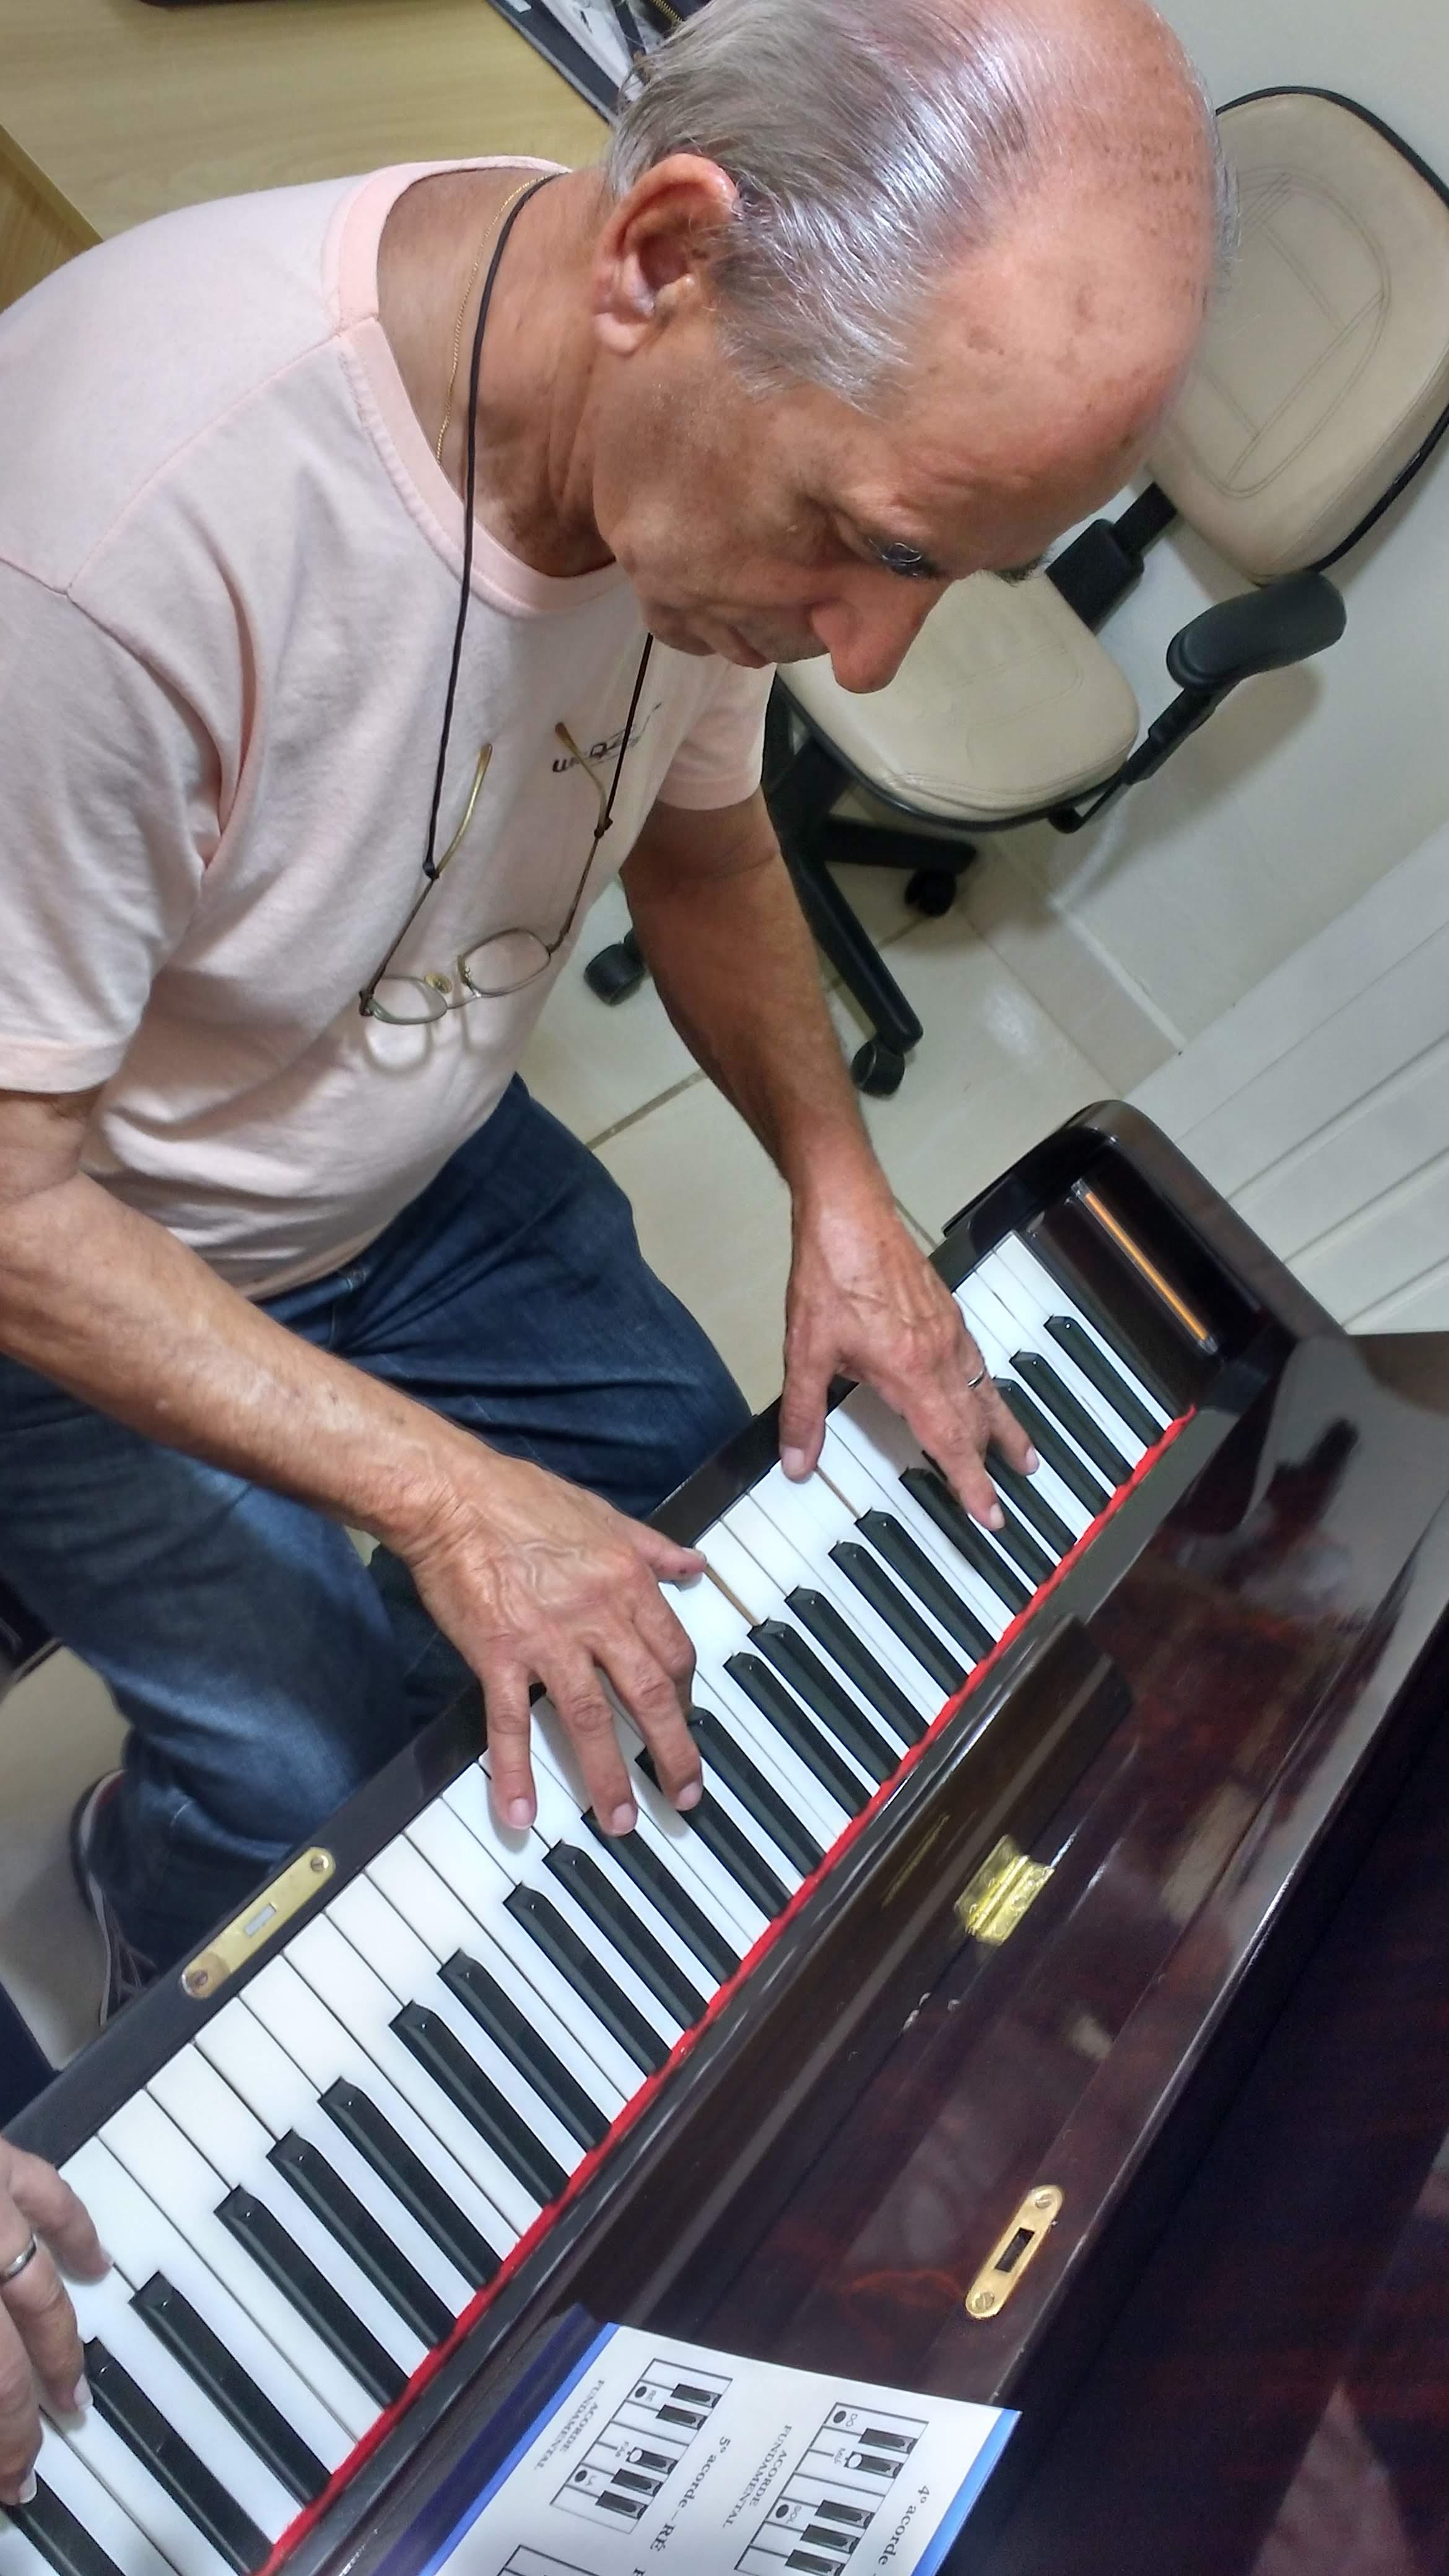 aulas de teclado para melhor idade contato escola de musica luciane borges professora de teclado 32-3223-8063